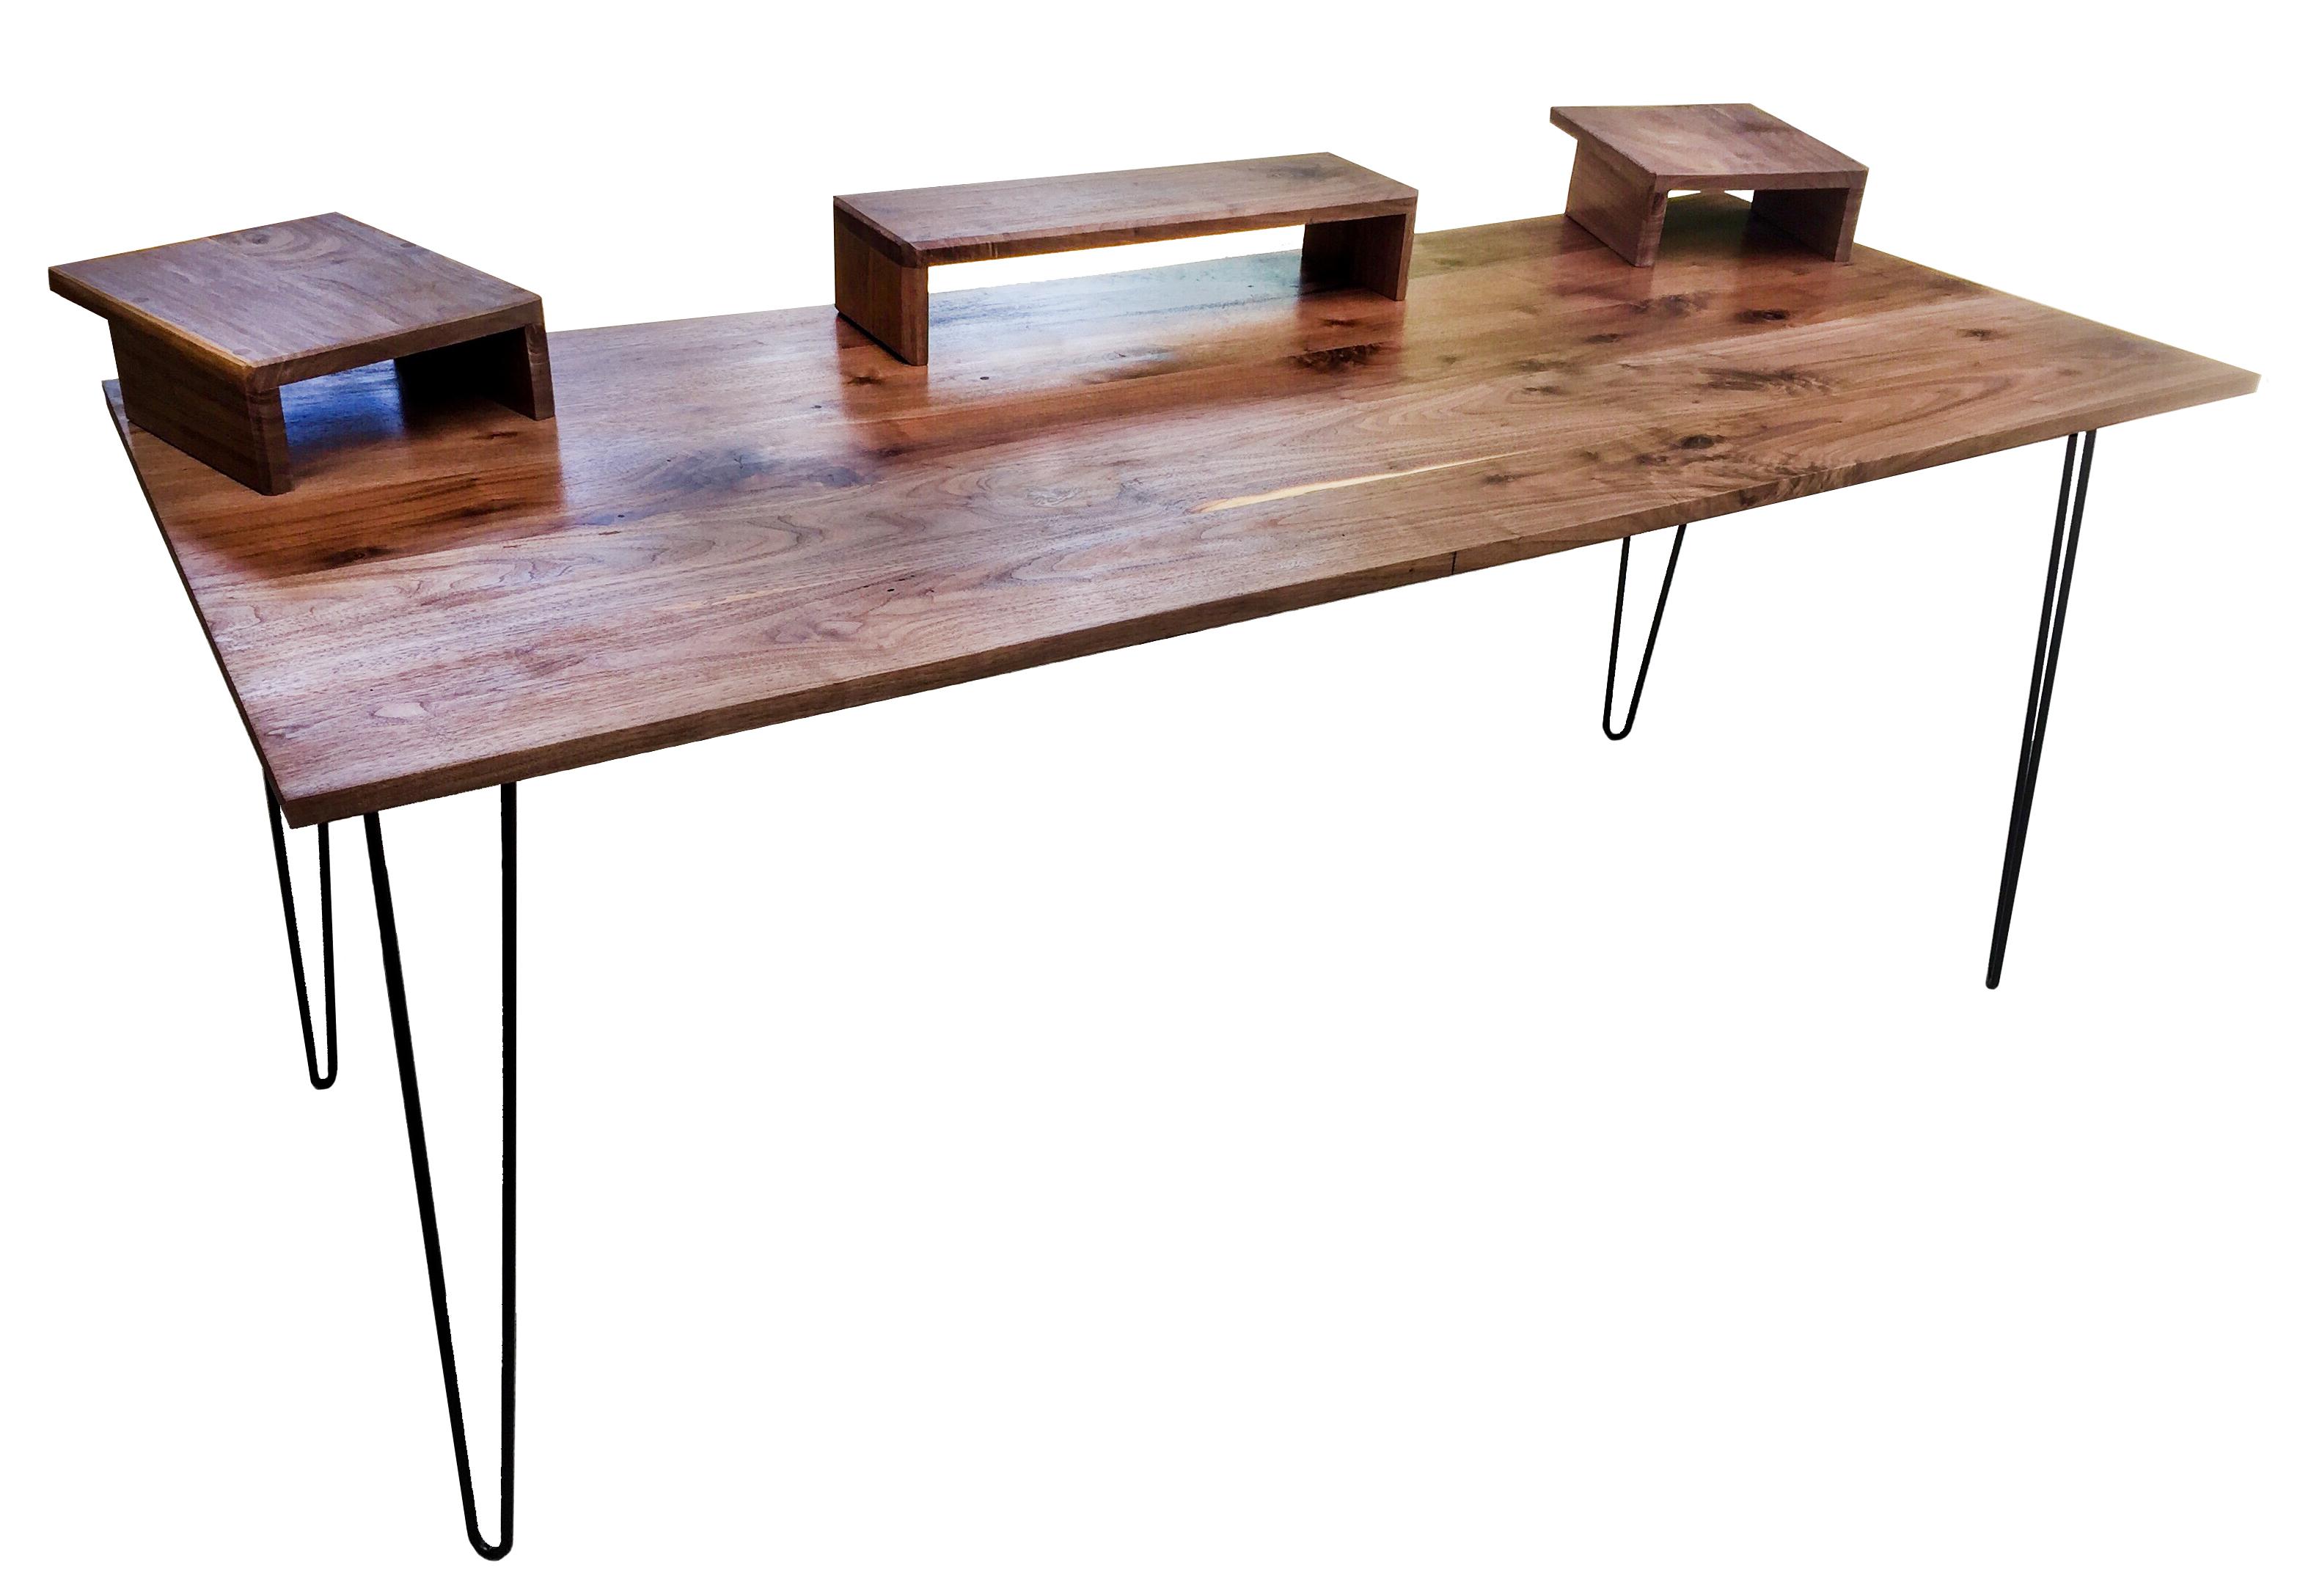 Reed's desk